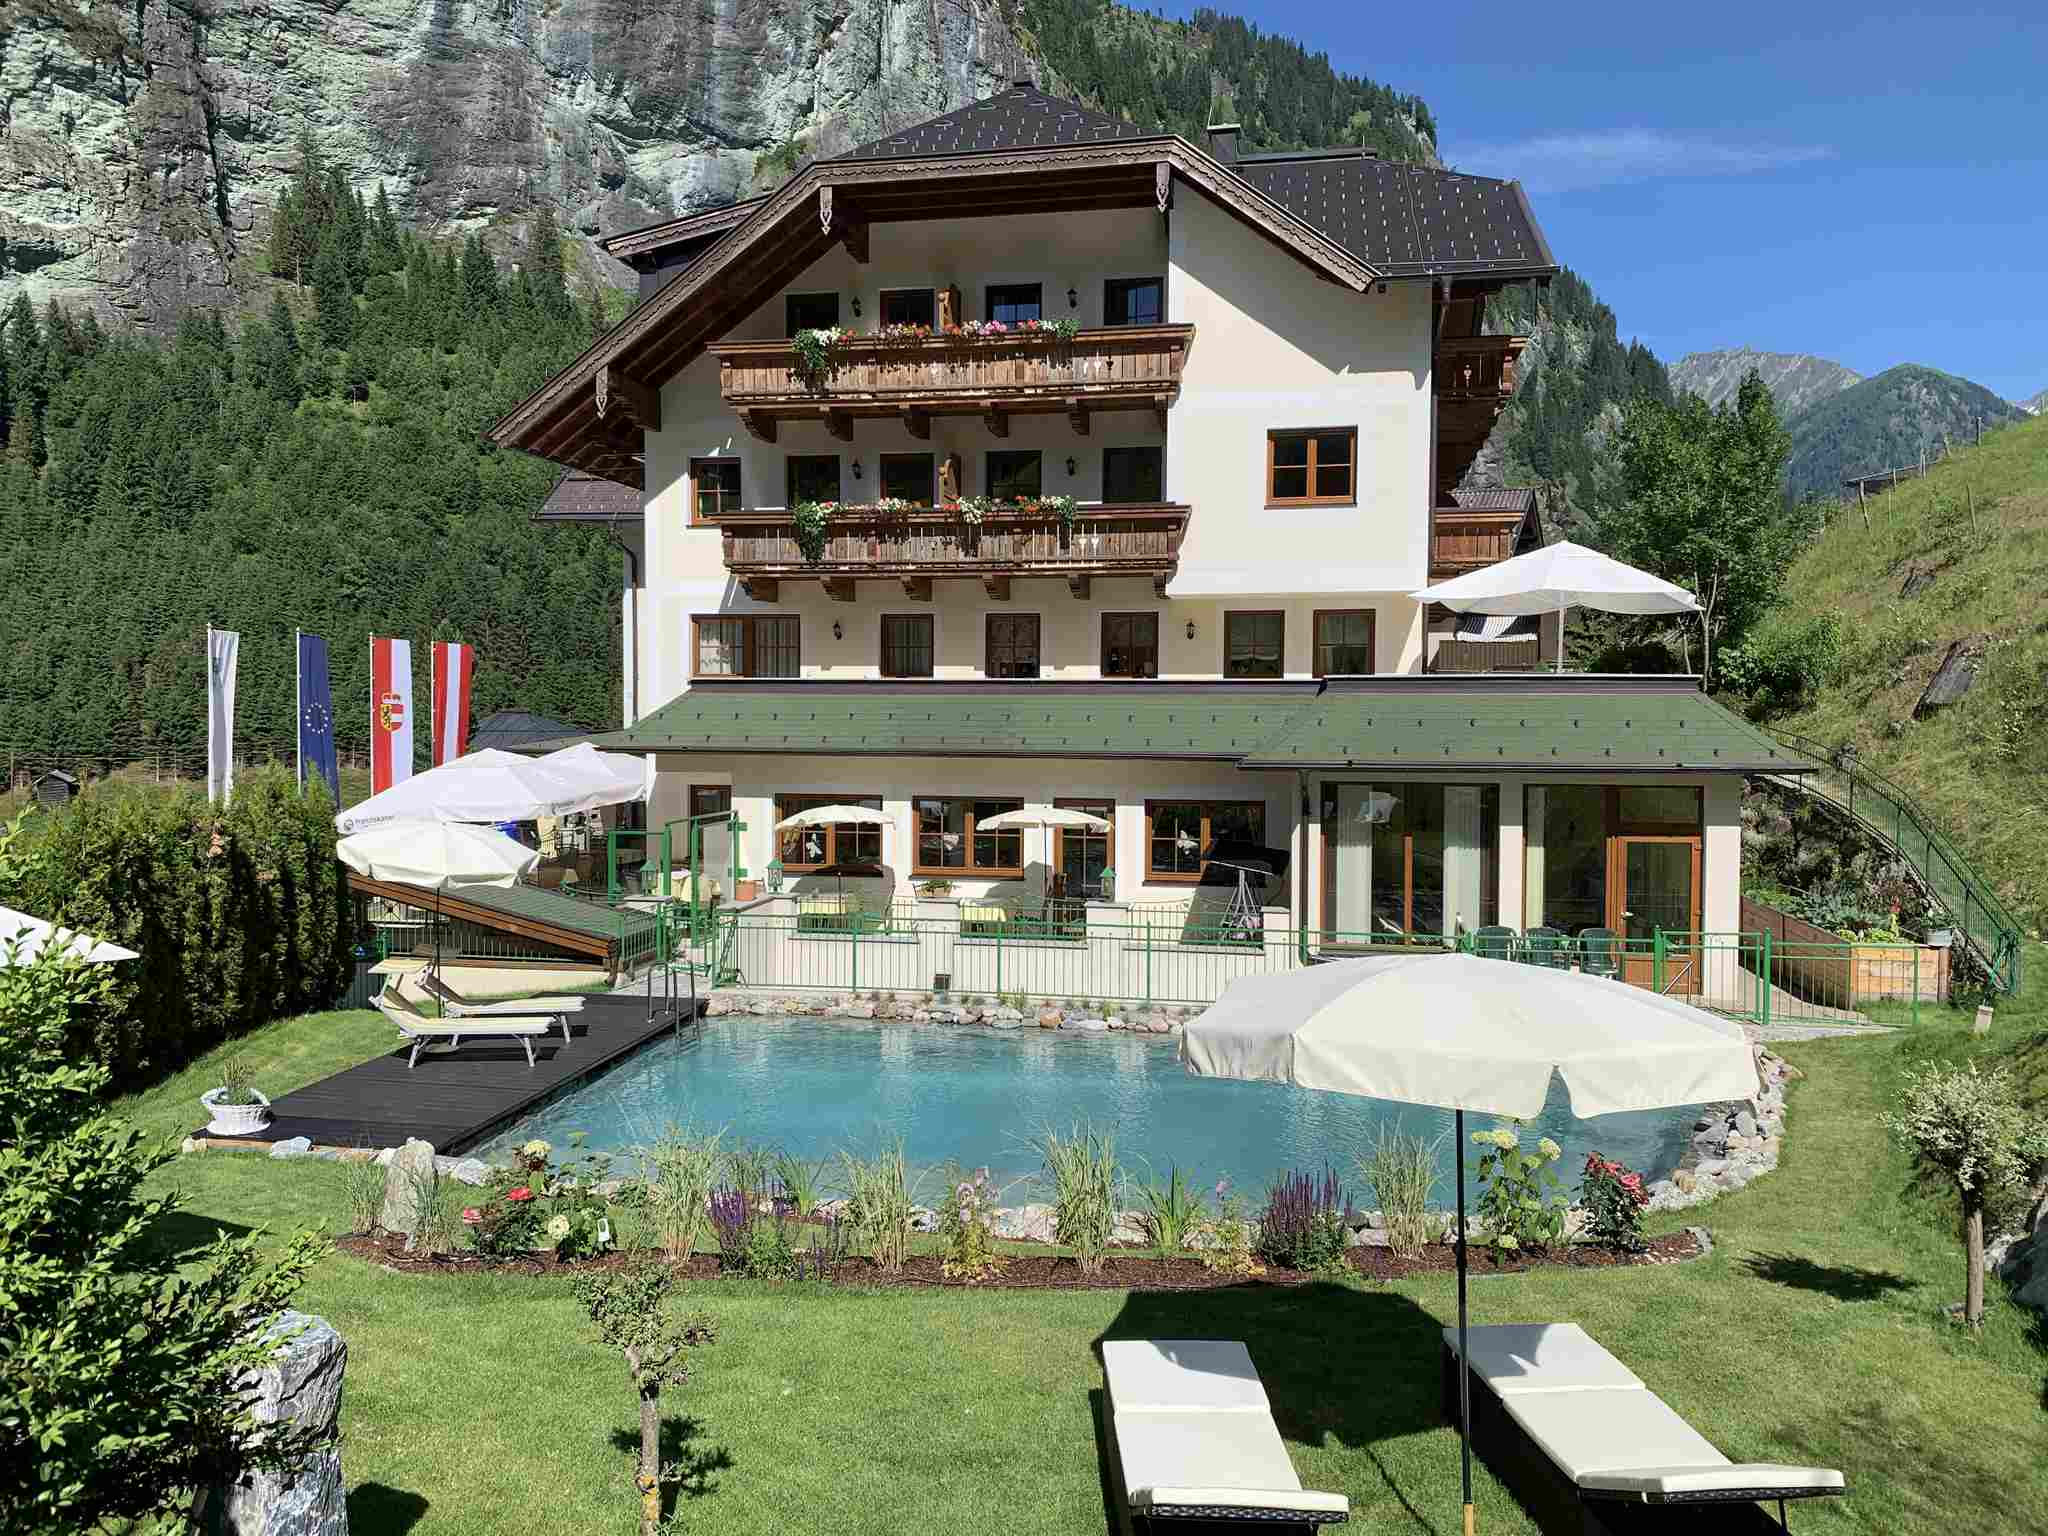 Hotel_großarl_pool_wandern